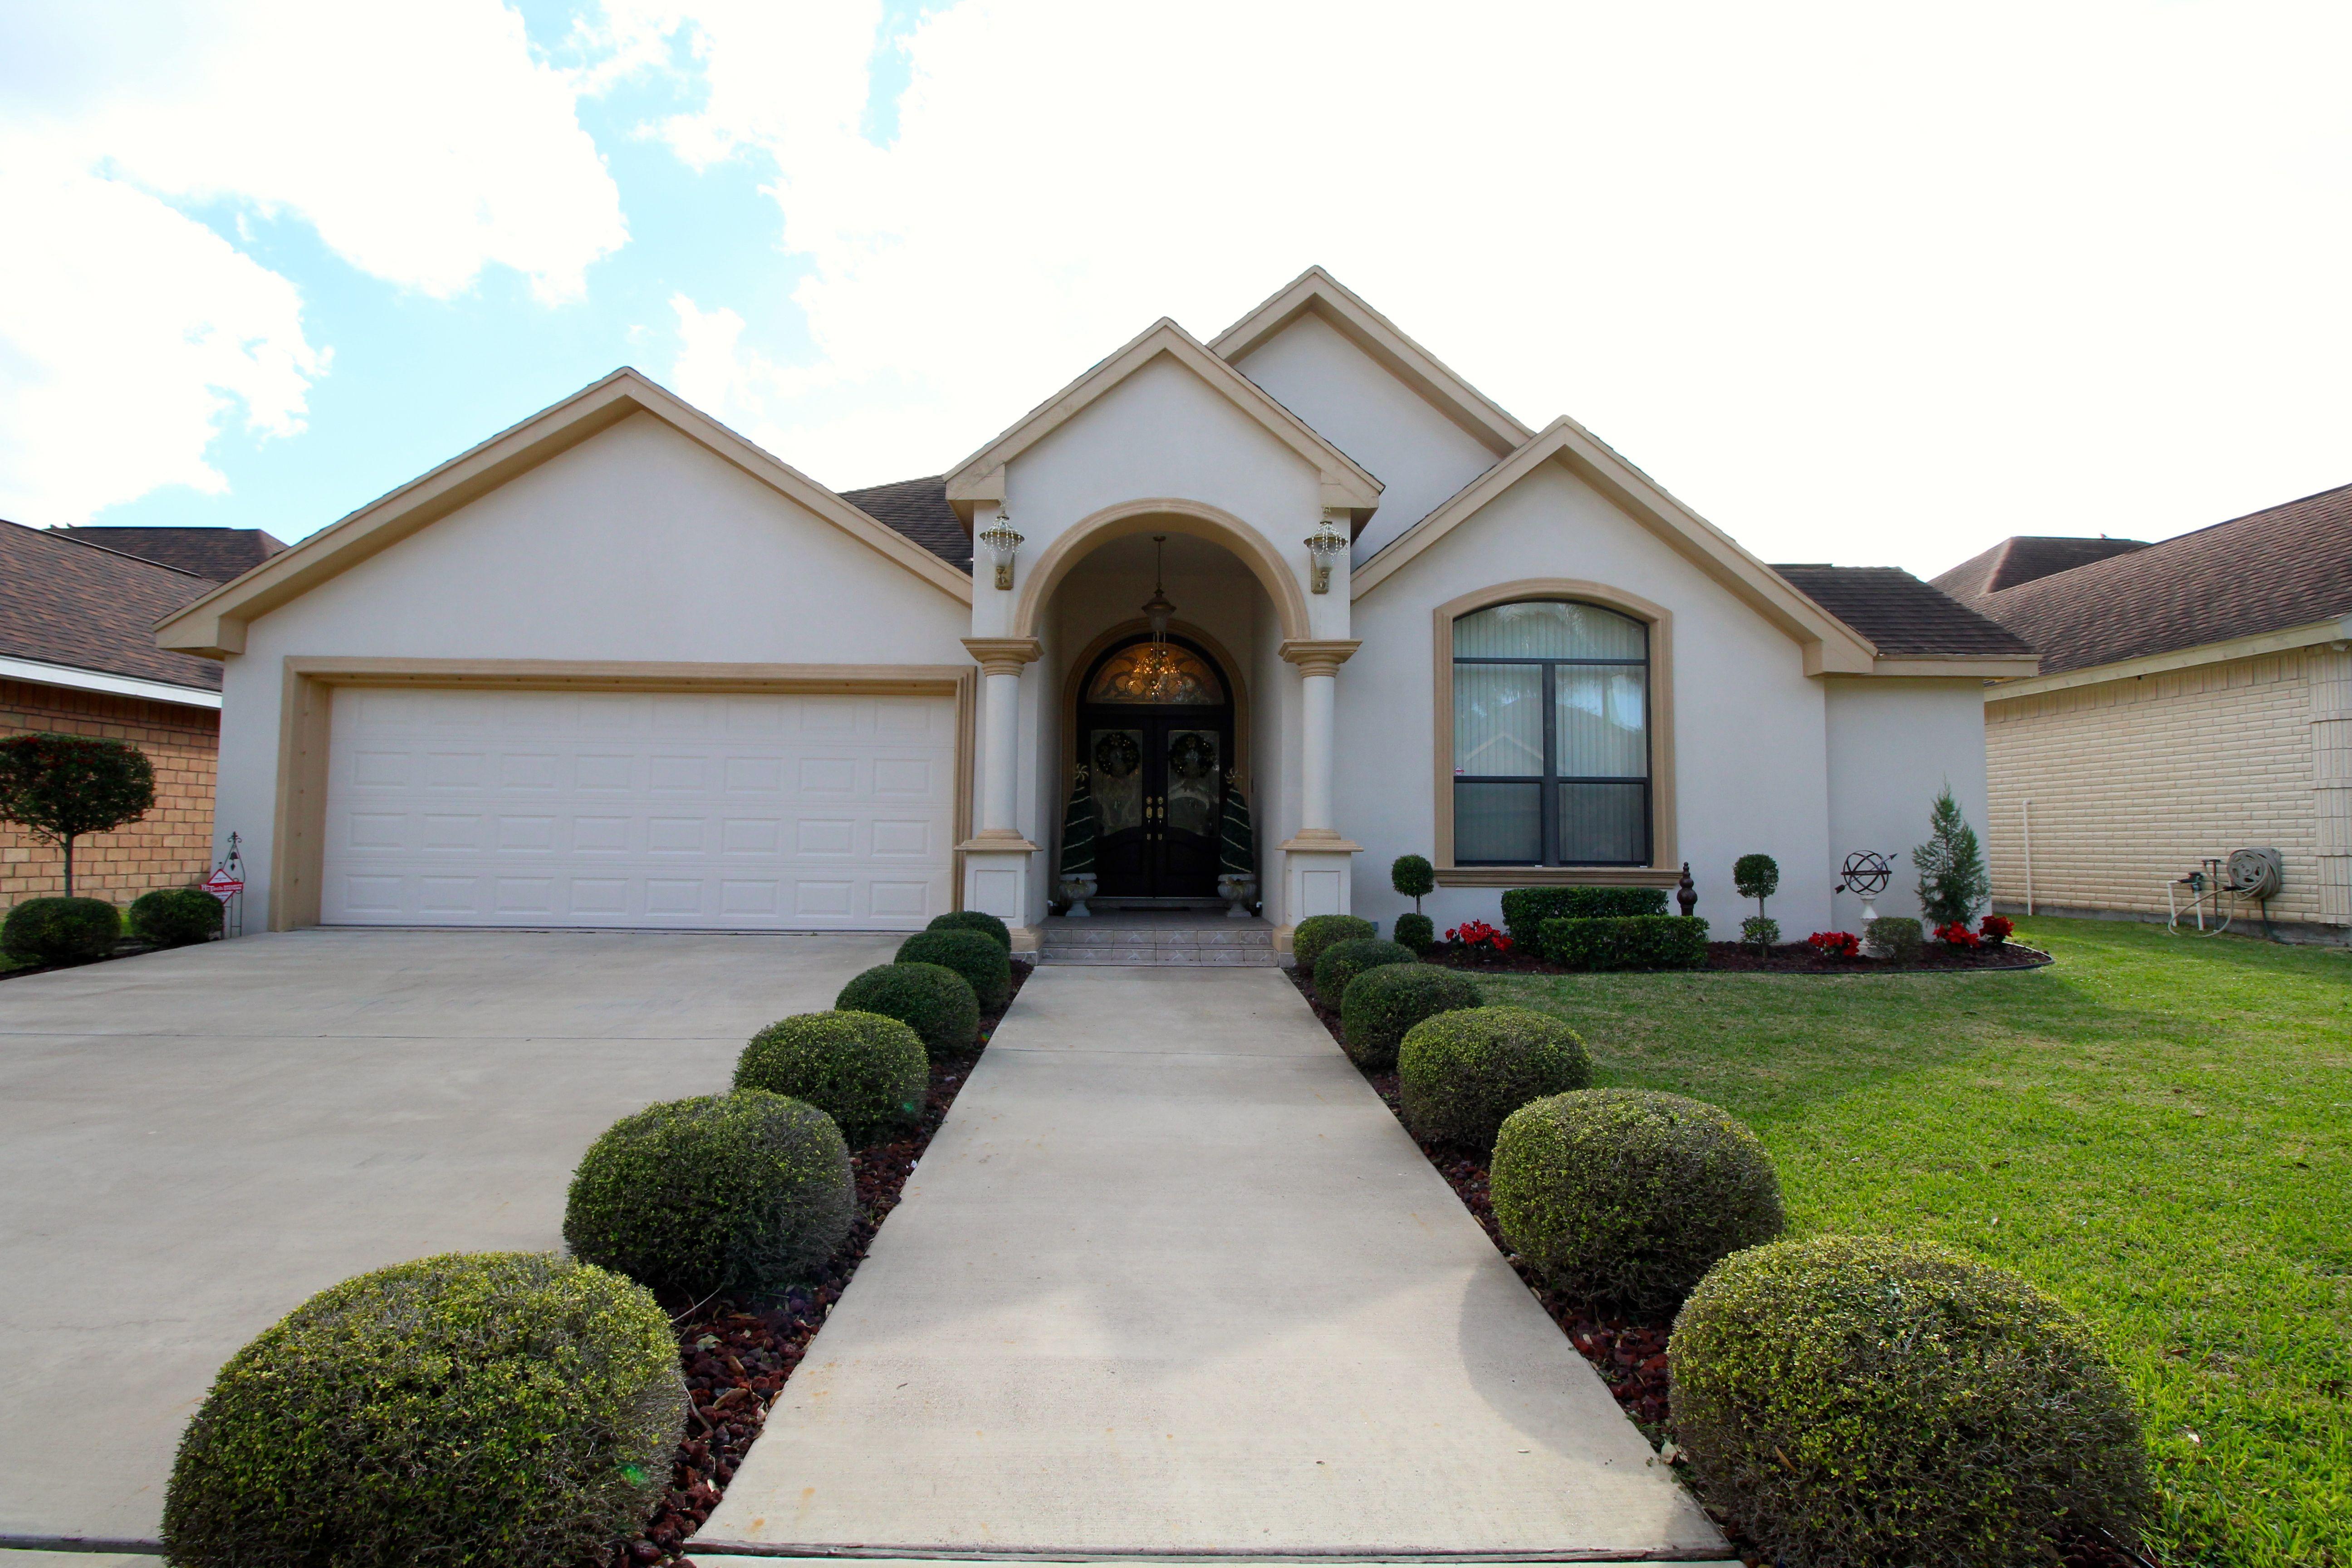 4106 san gerardo mission tx 78572 homes for sale in mcallen tx rh pinterest com